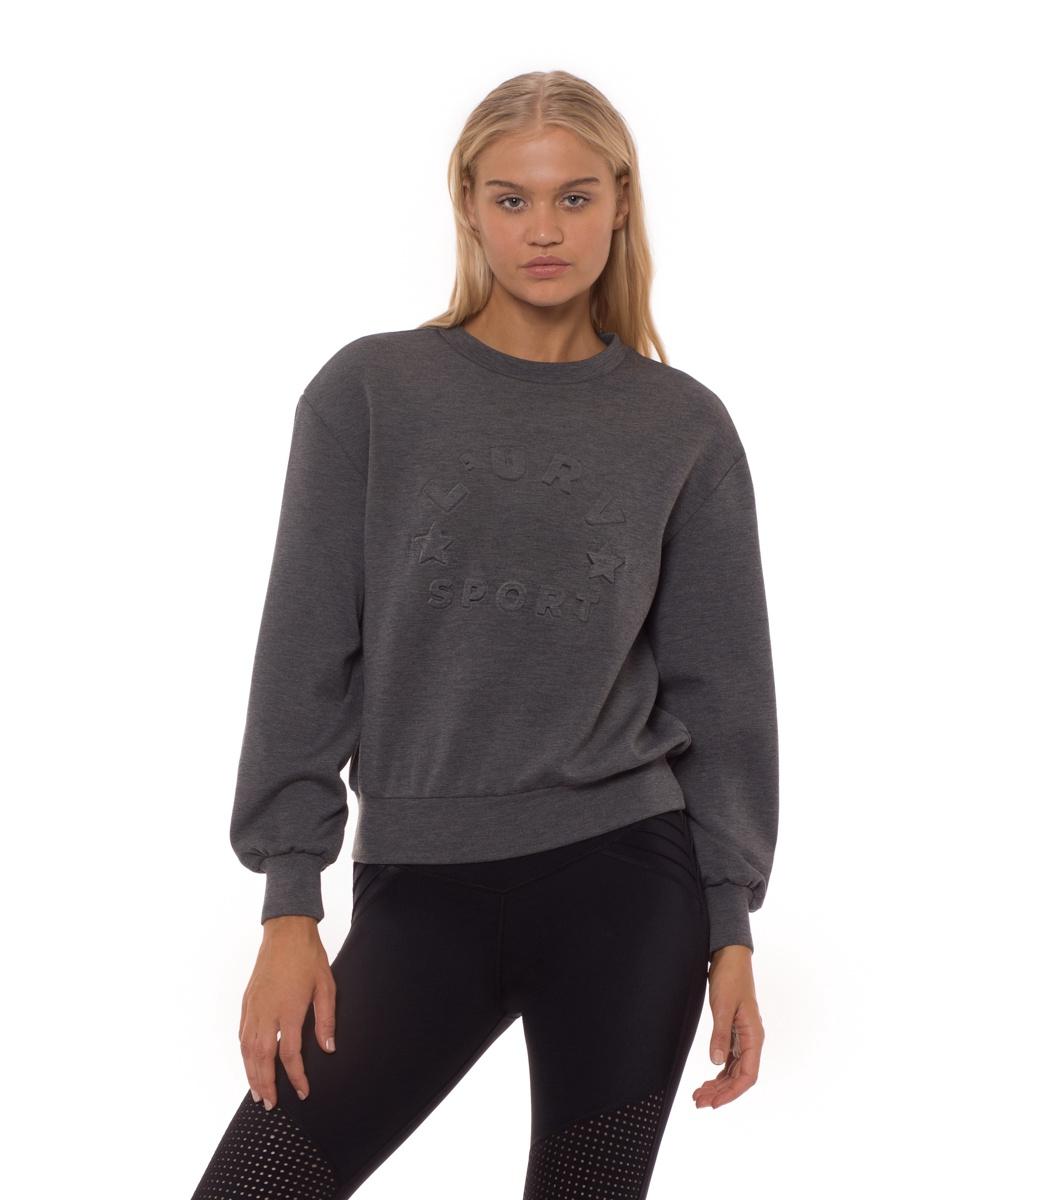 The Fast Lane Sweater